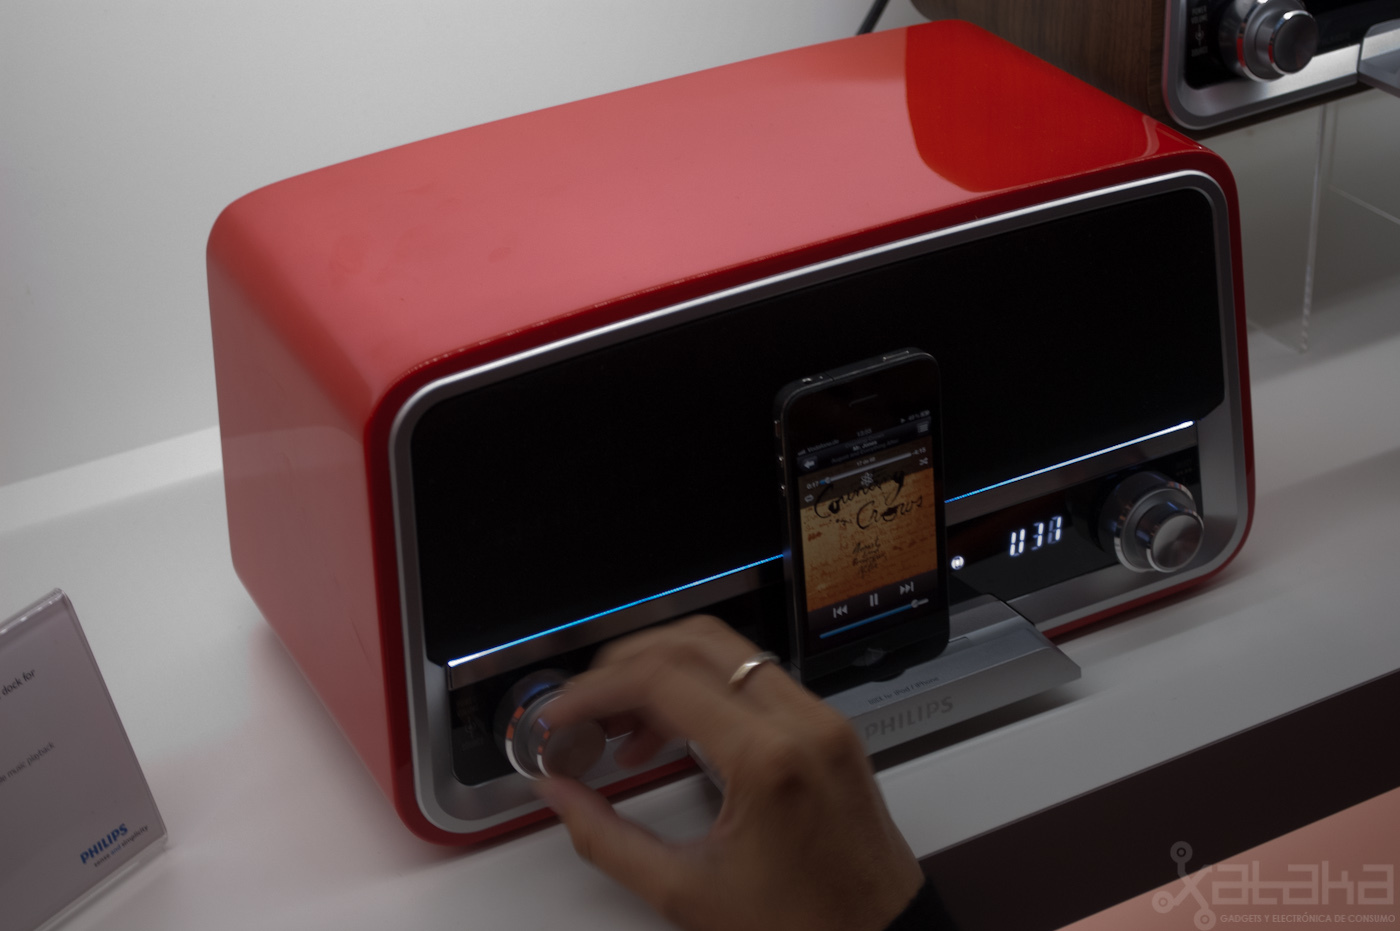 Philips Original Radio en IFA 2012